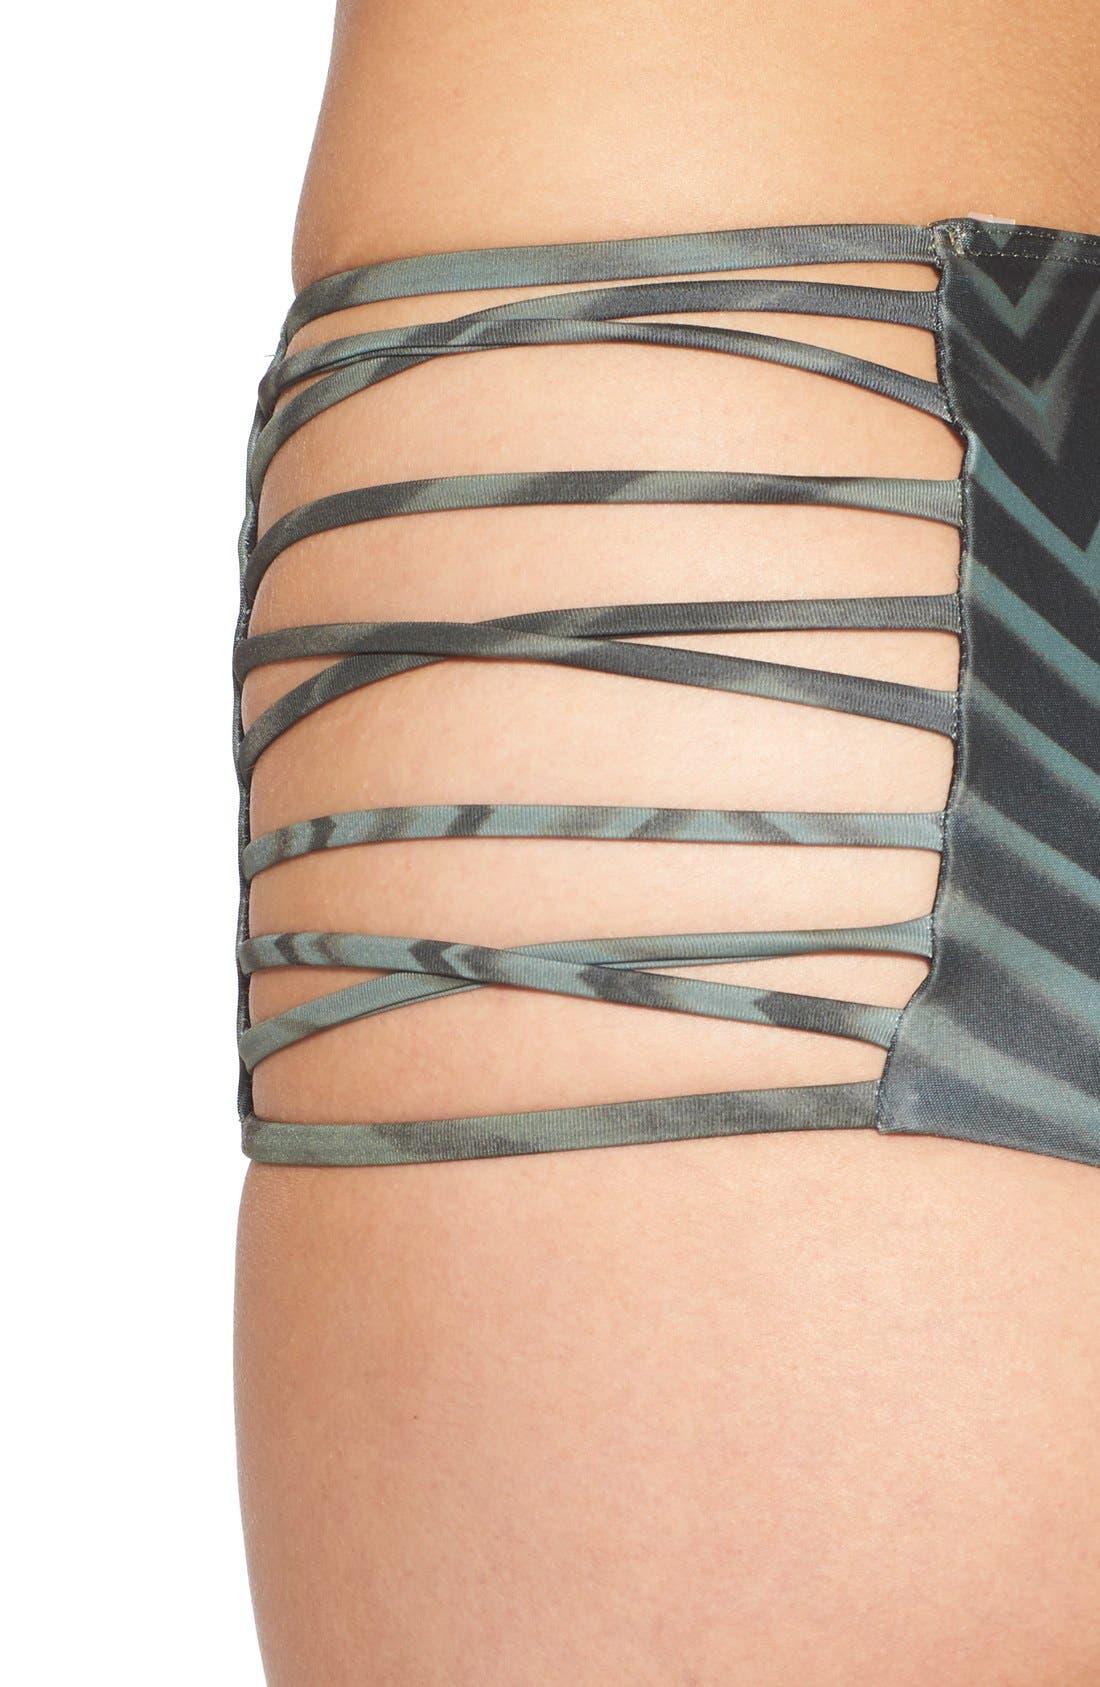 Alternate Image 4  - RVCA 'Palm' Print High Waist Cheeky Bikini Bottoms